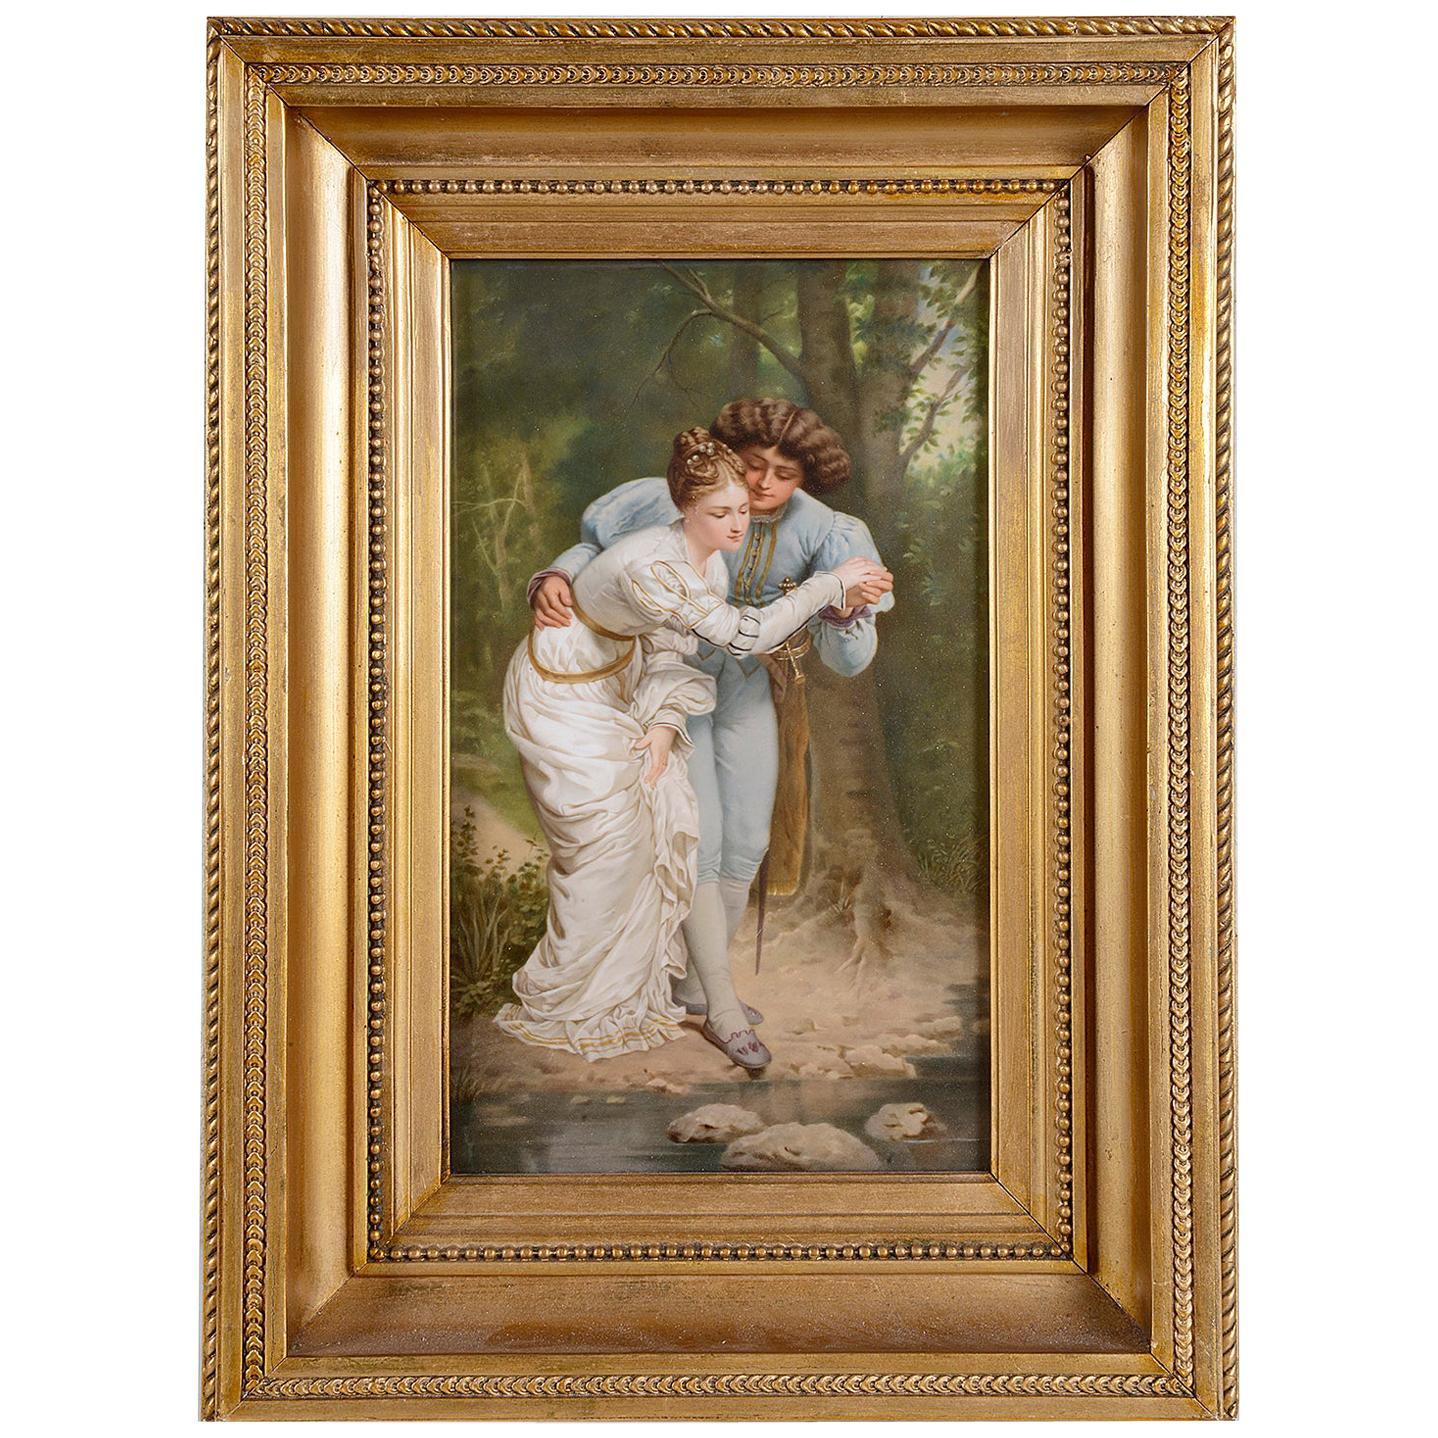 KPM Porcelain Plaque, of Young Lovers